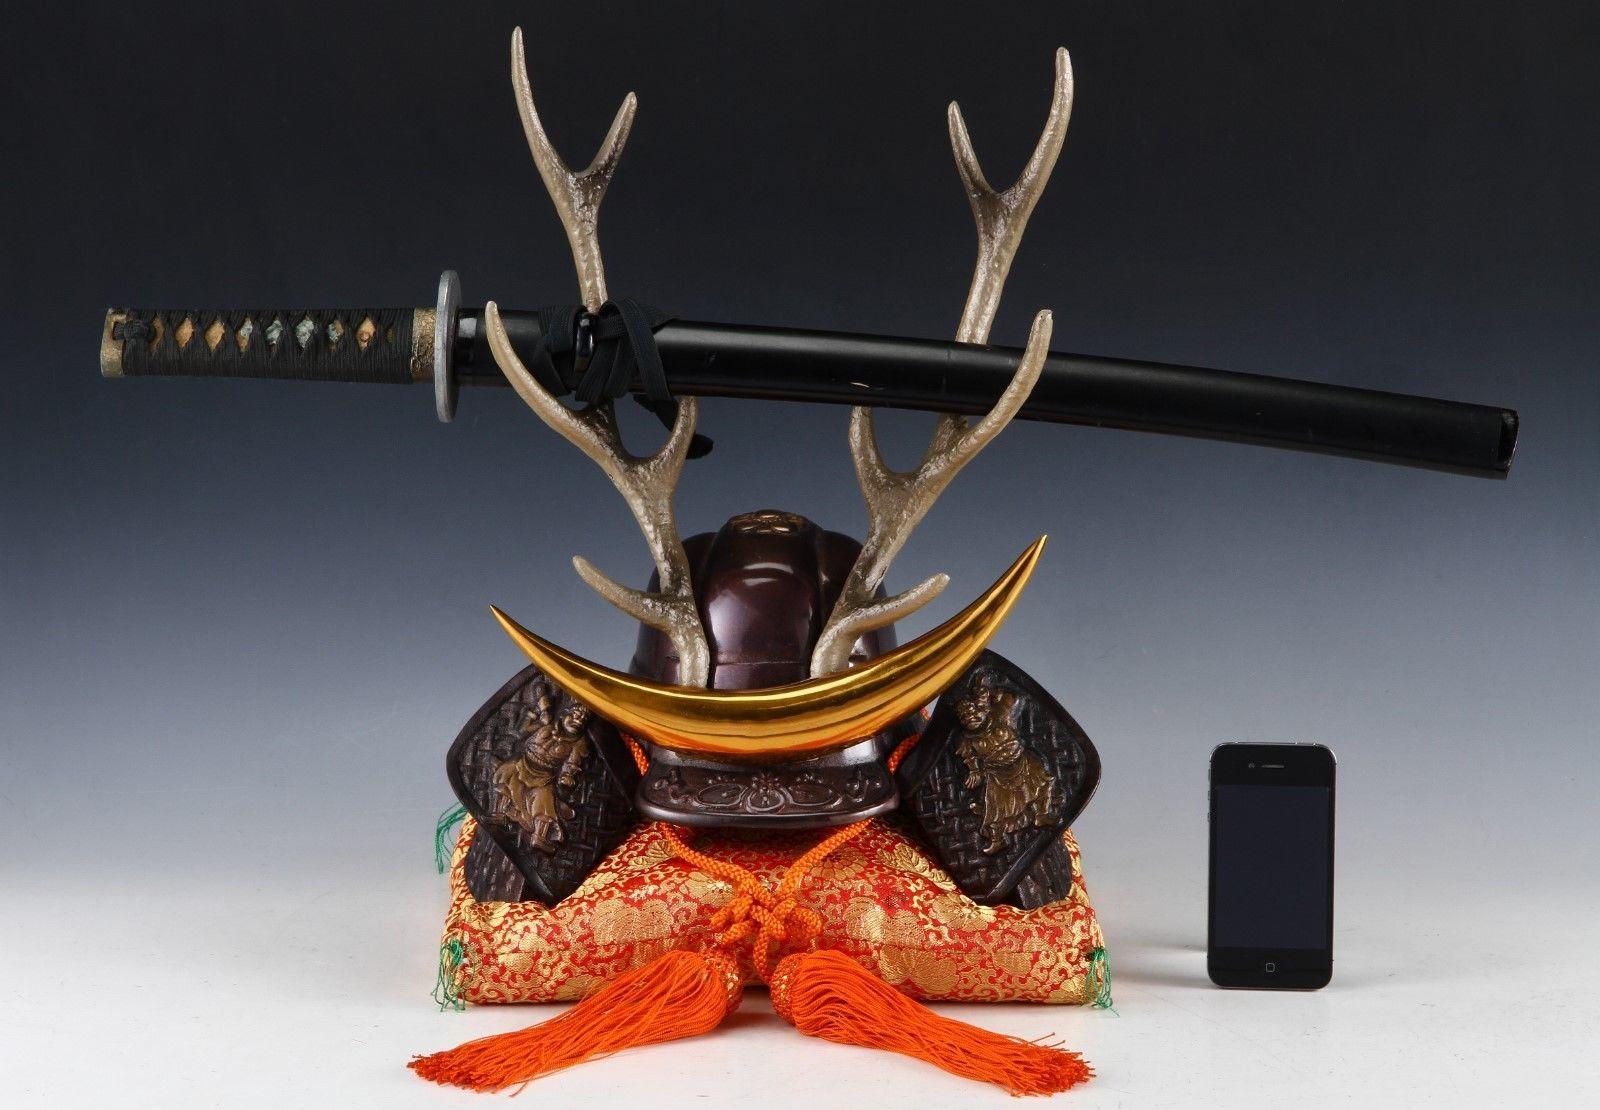 Japanese Beautiful Samurai Helmet -shikanosuke kabuto- with a Replica Blade image 12